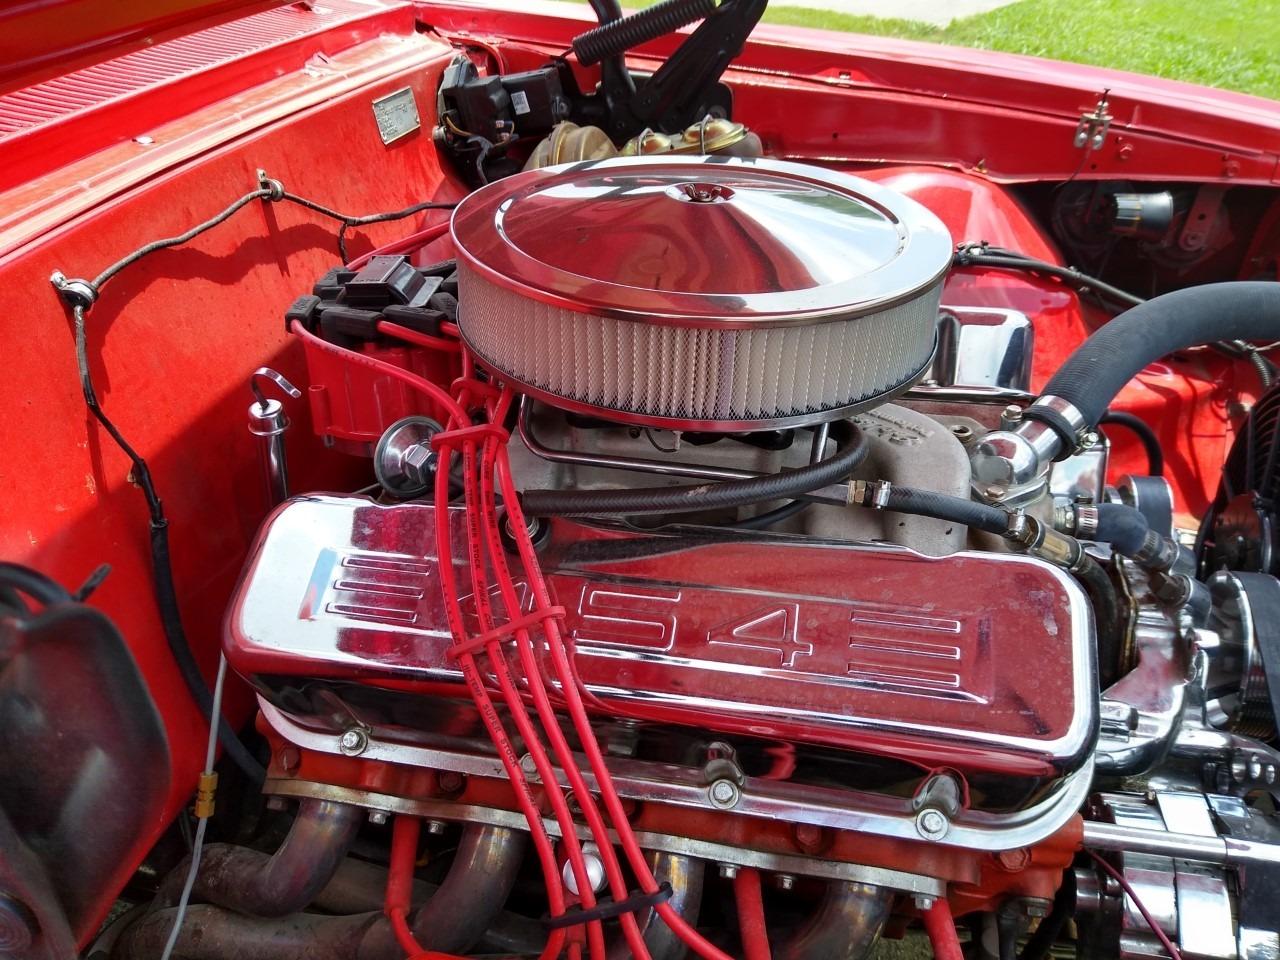 Used 1967 Chevrolet Chevelle -BIG BLOCK 454 RESTORED CONDITION | Mundelein, IL